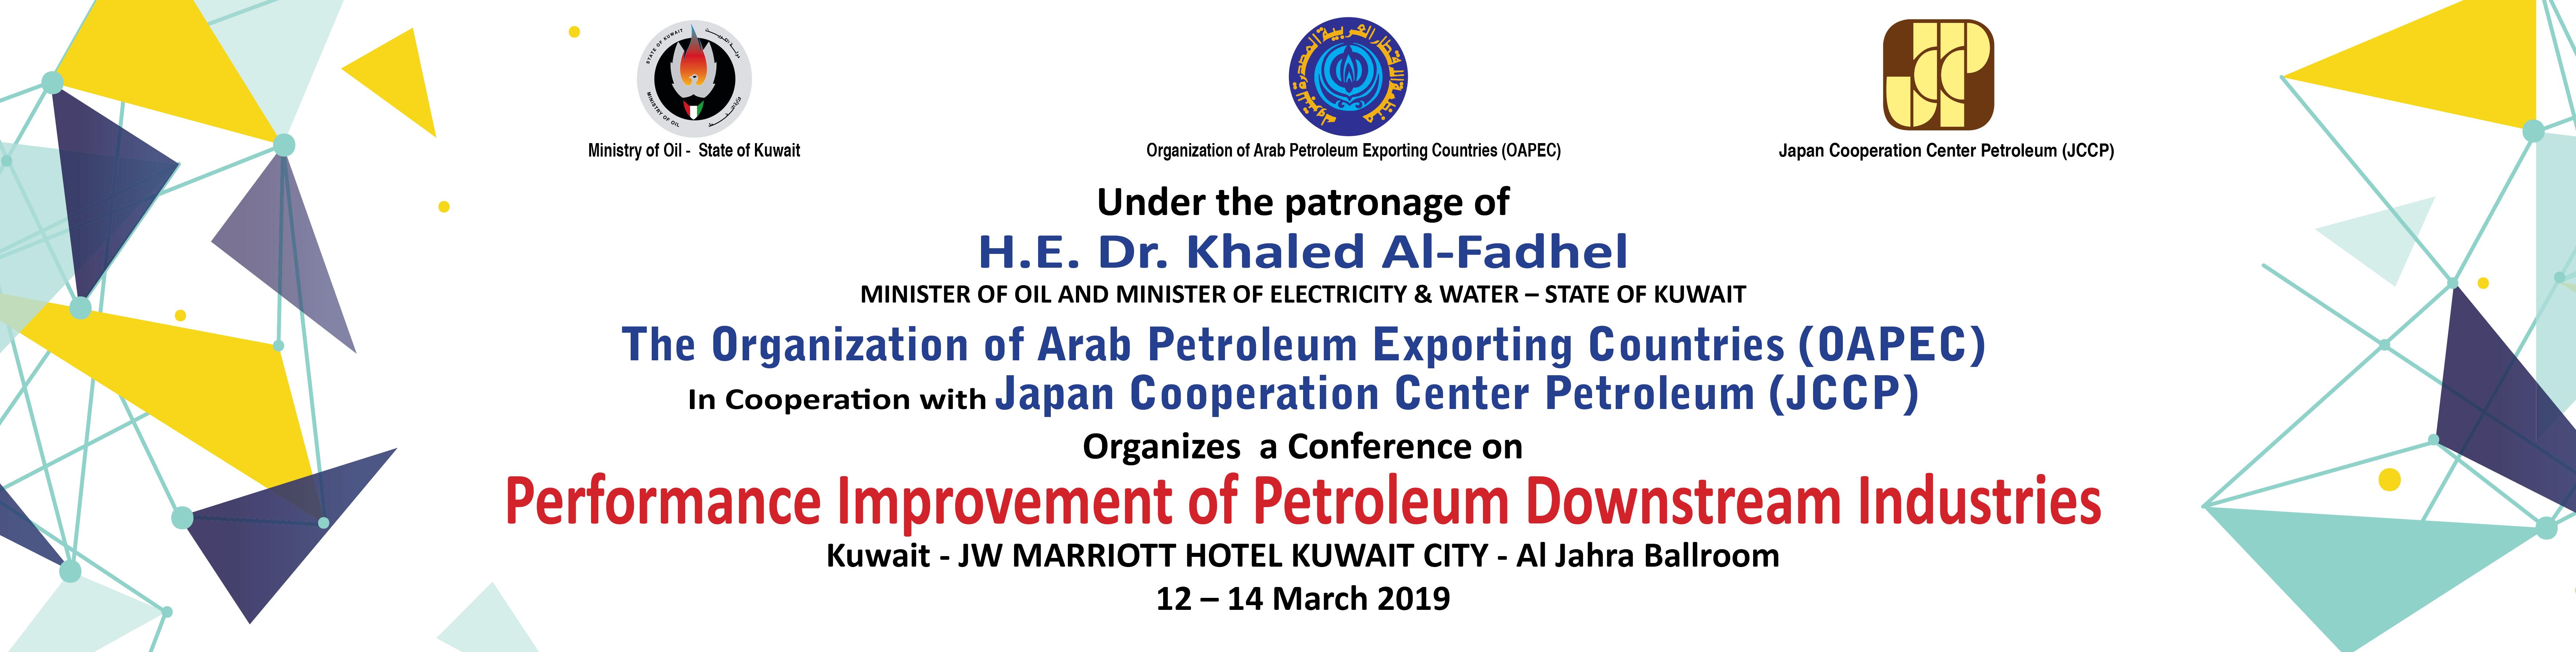 Current Vacancies Open In Kuwait Oil Kuwait Oil Jobs